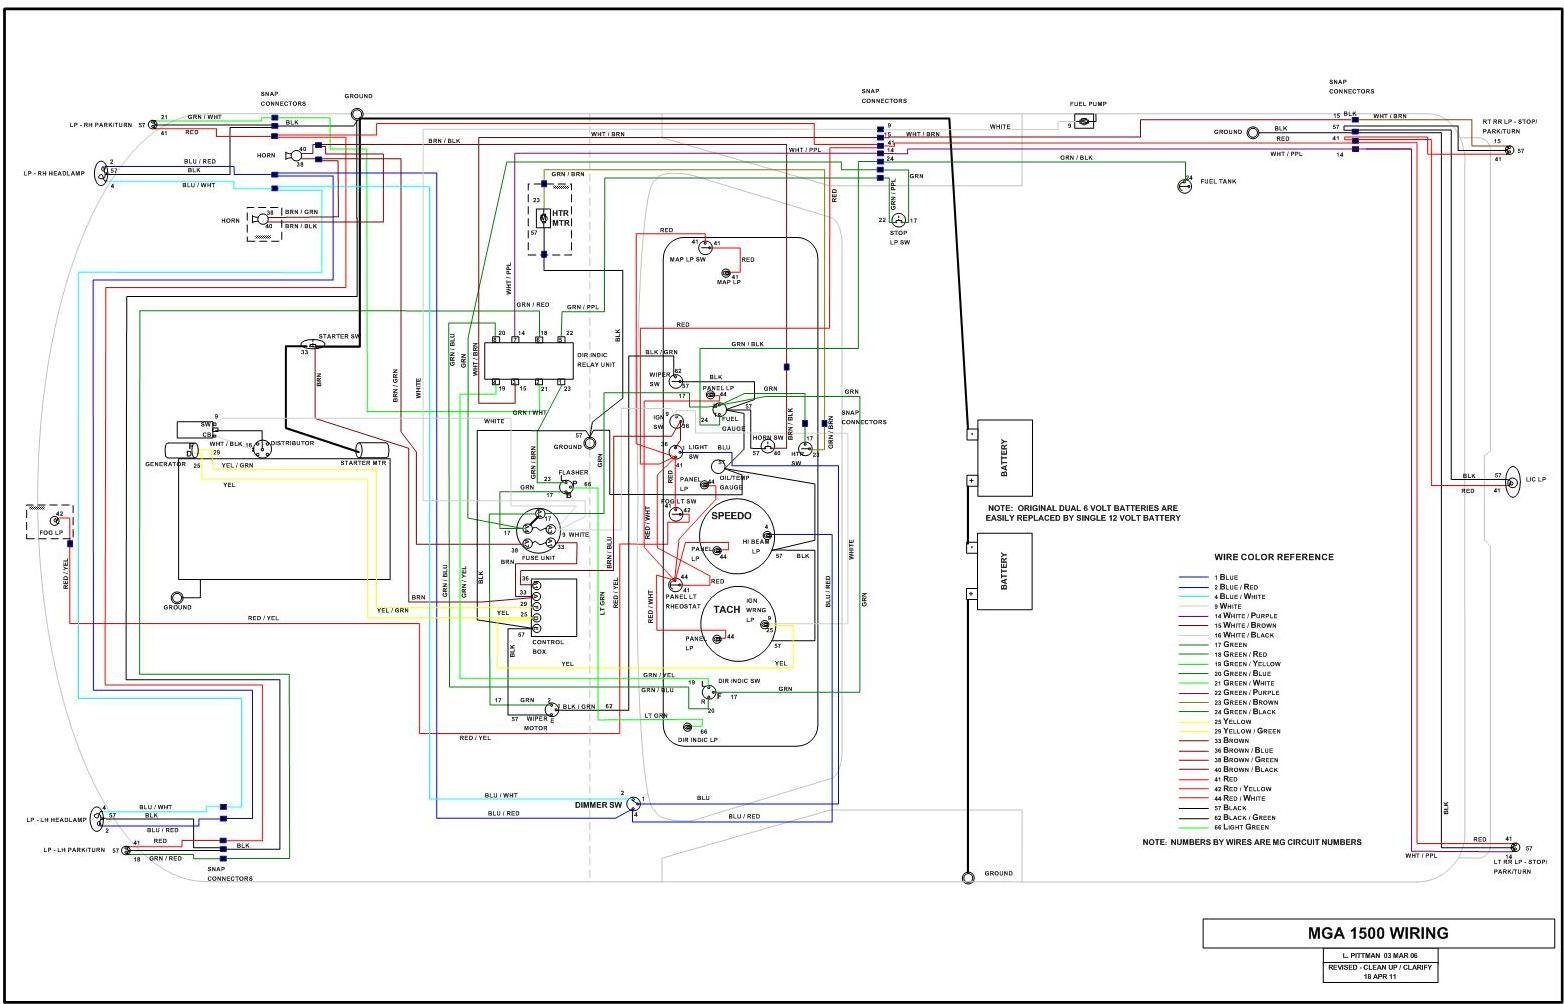 Mg Midget 1500 Wiring Diagram